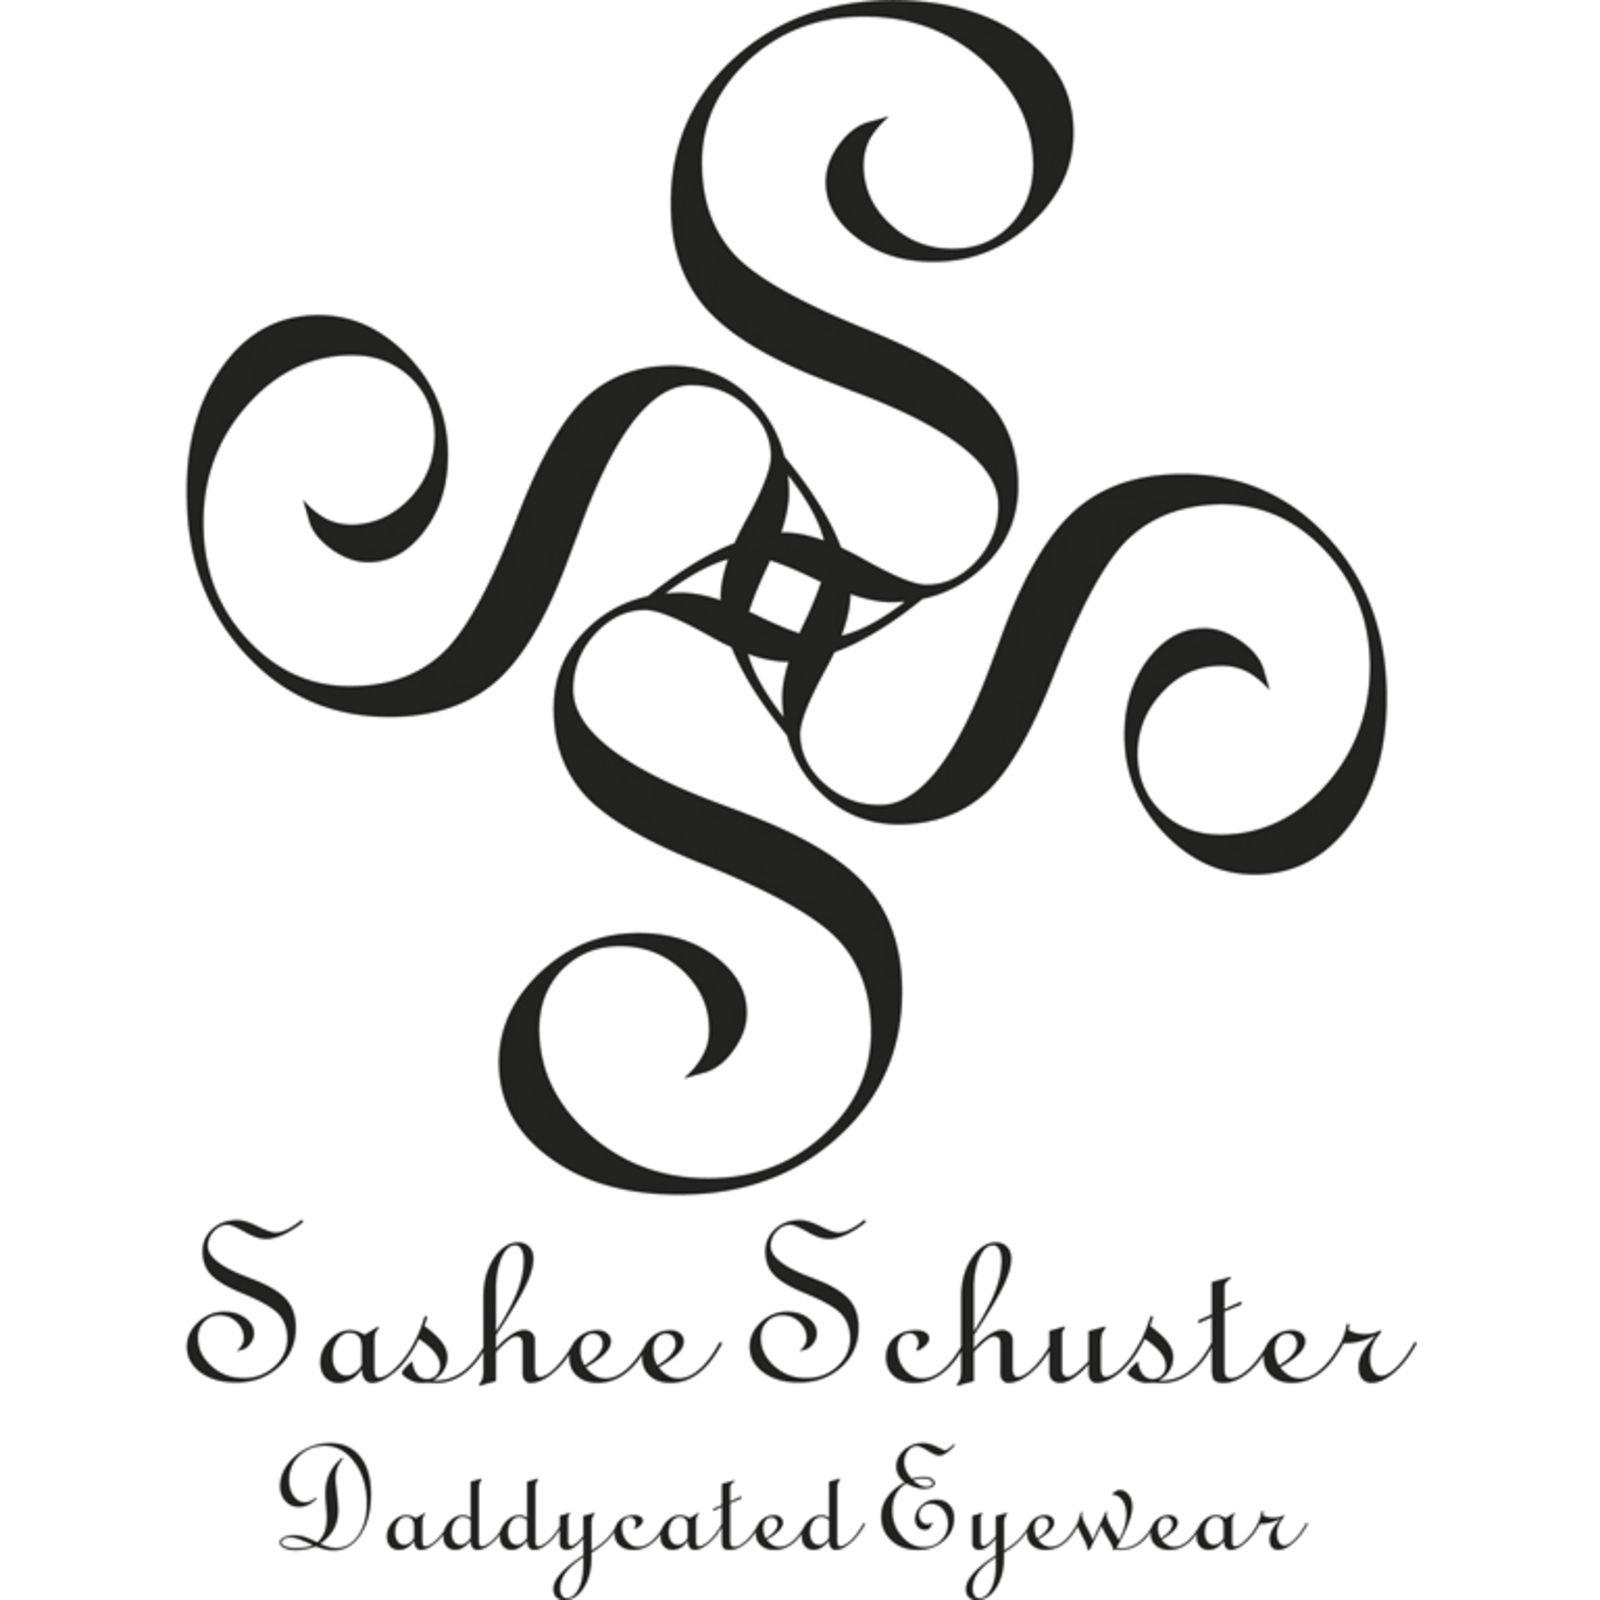 Sashee Schuster